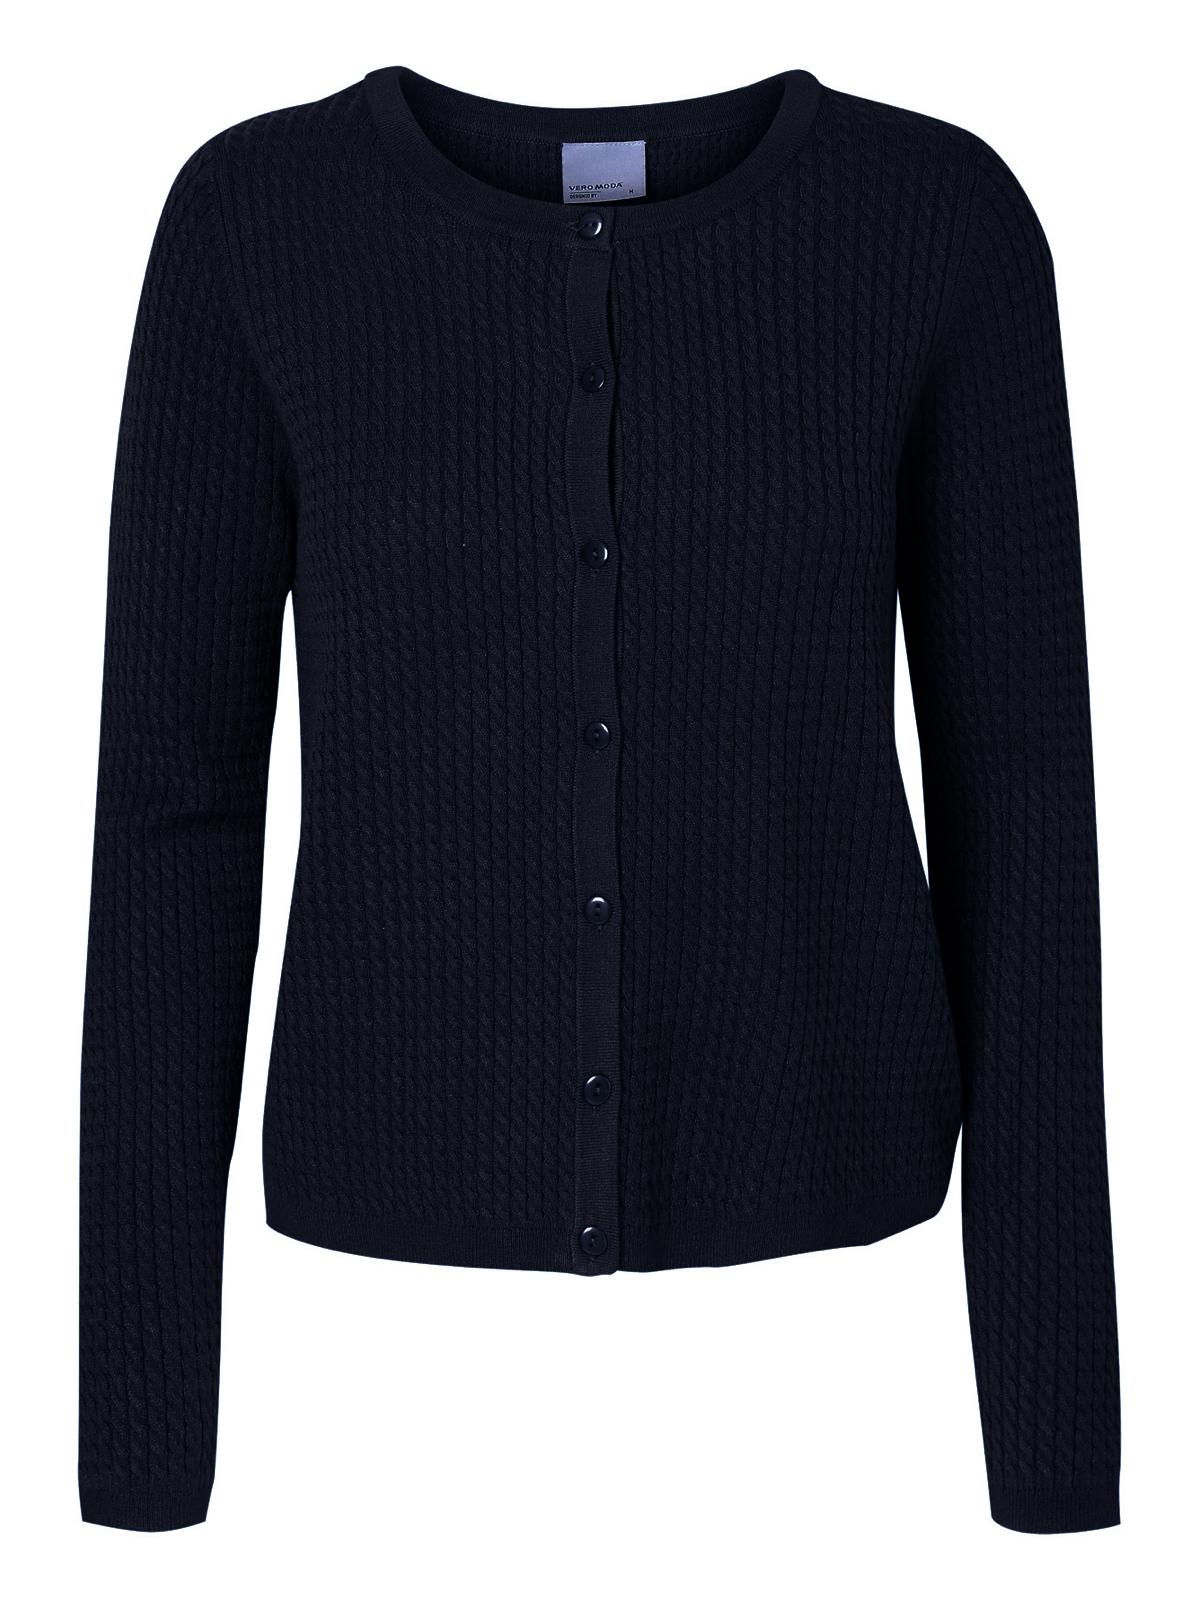 907d019f78 Vero Moda Damen Strickjacke XS S M L XL schwarz grau blau kurzer Cardigan  NEU